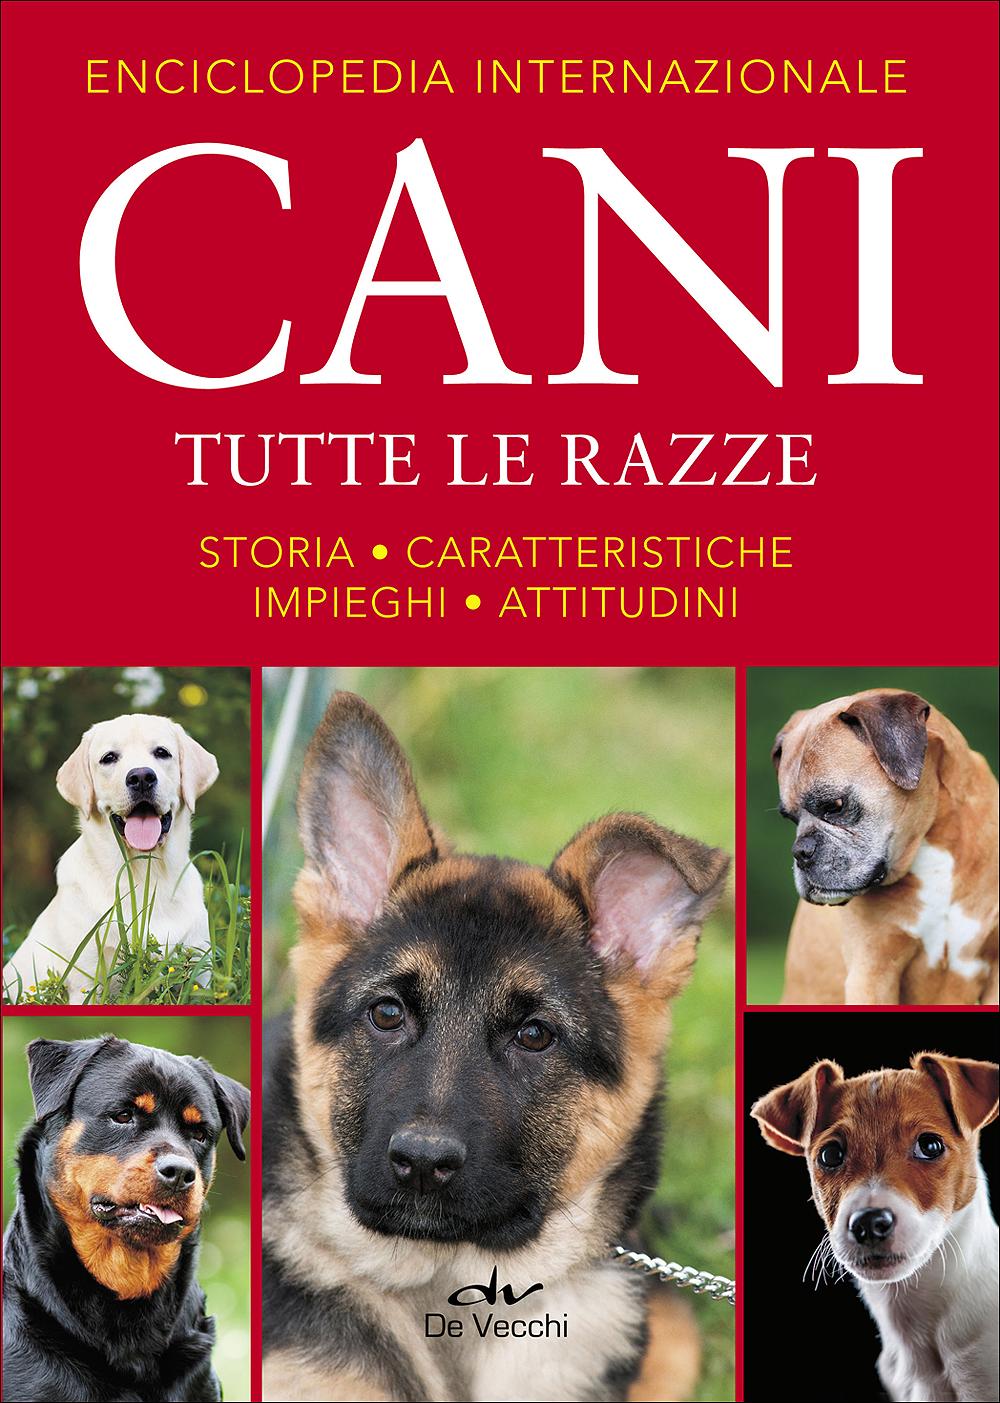 Enciclopedia internazionale Cani. Tutte le razze